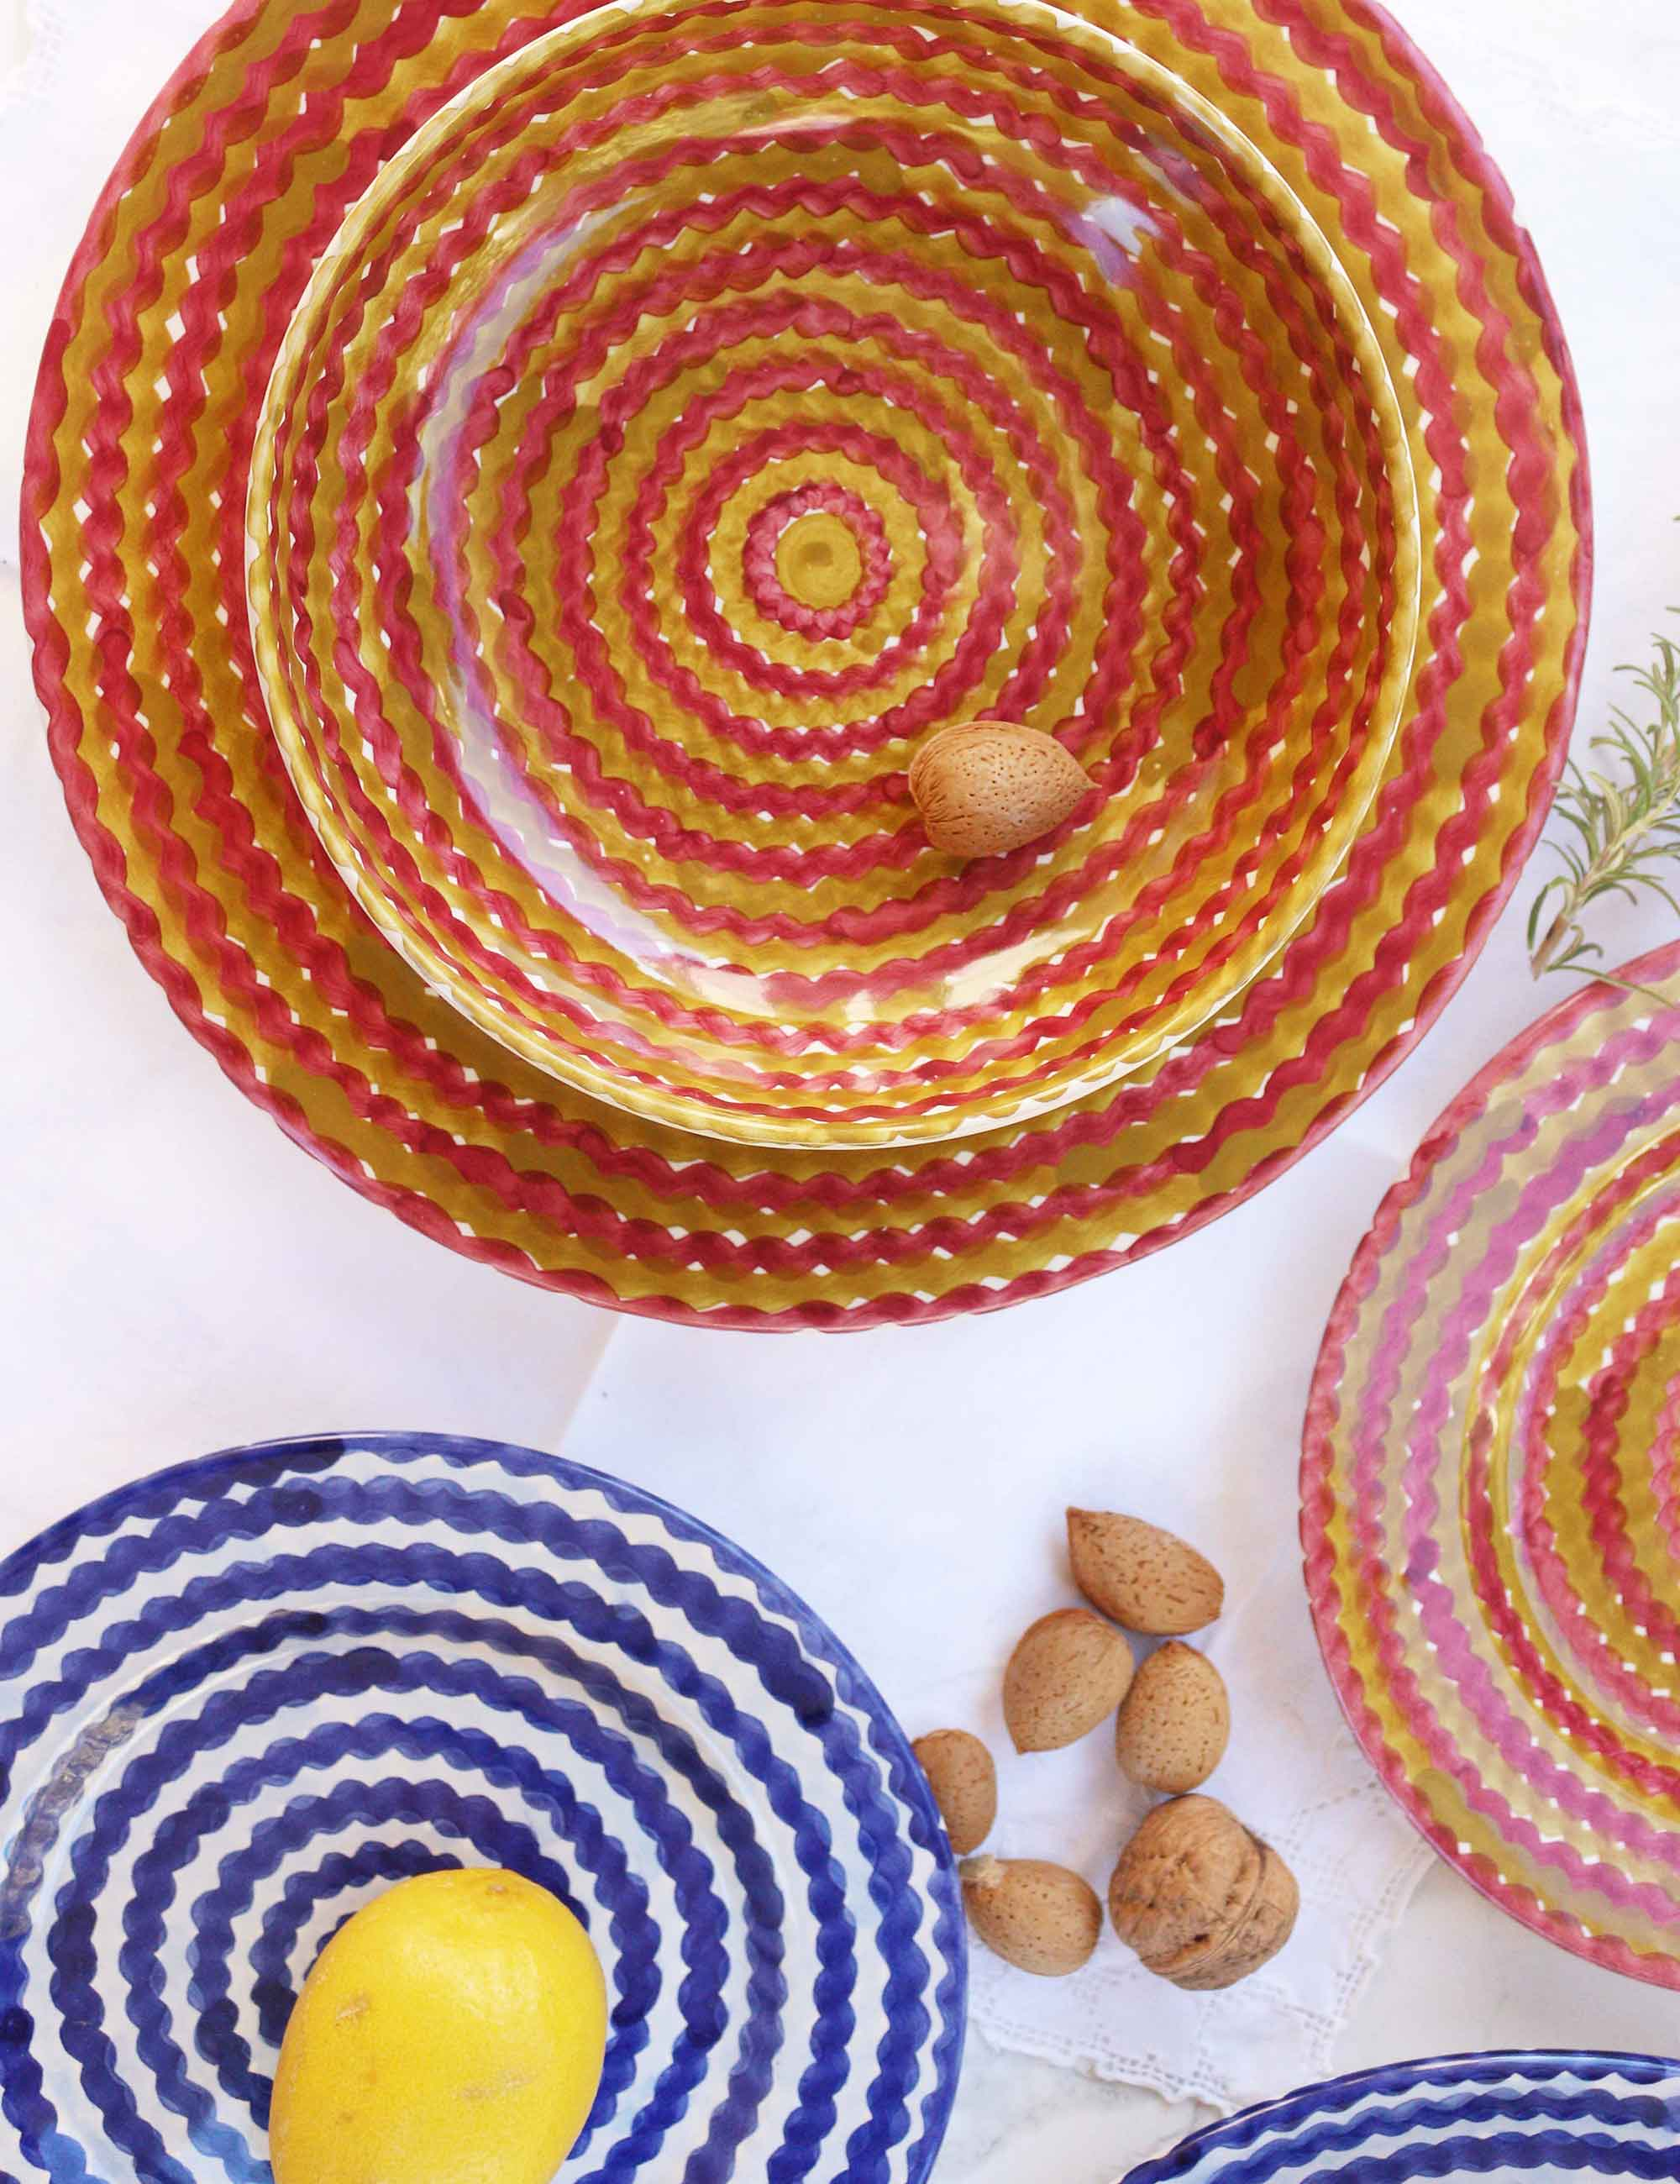 Piatti in ceramica decorata siciliana blu profondo e terra bruciata